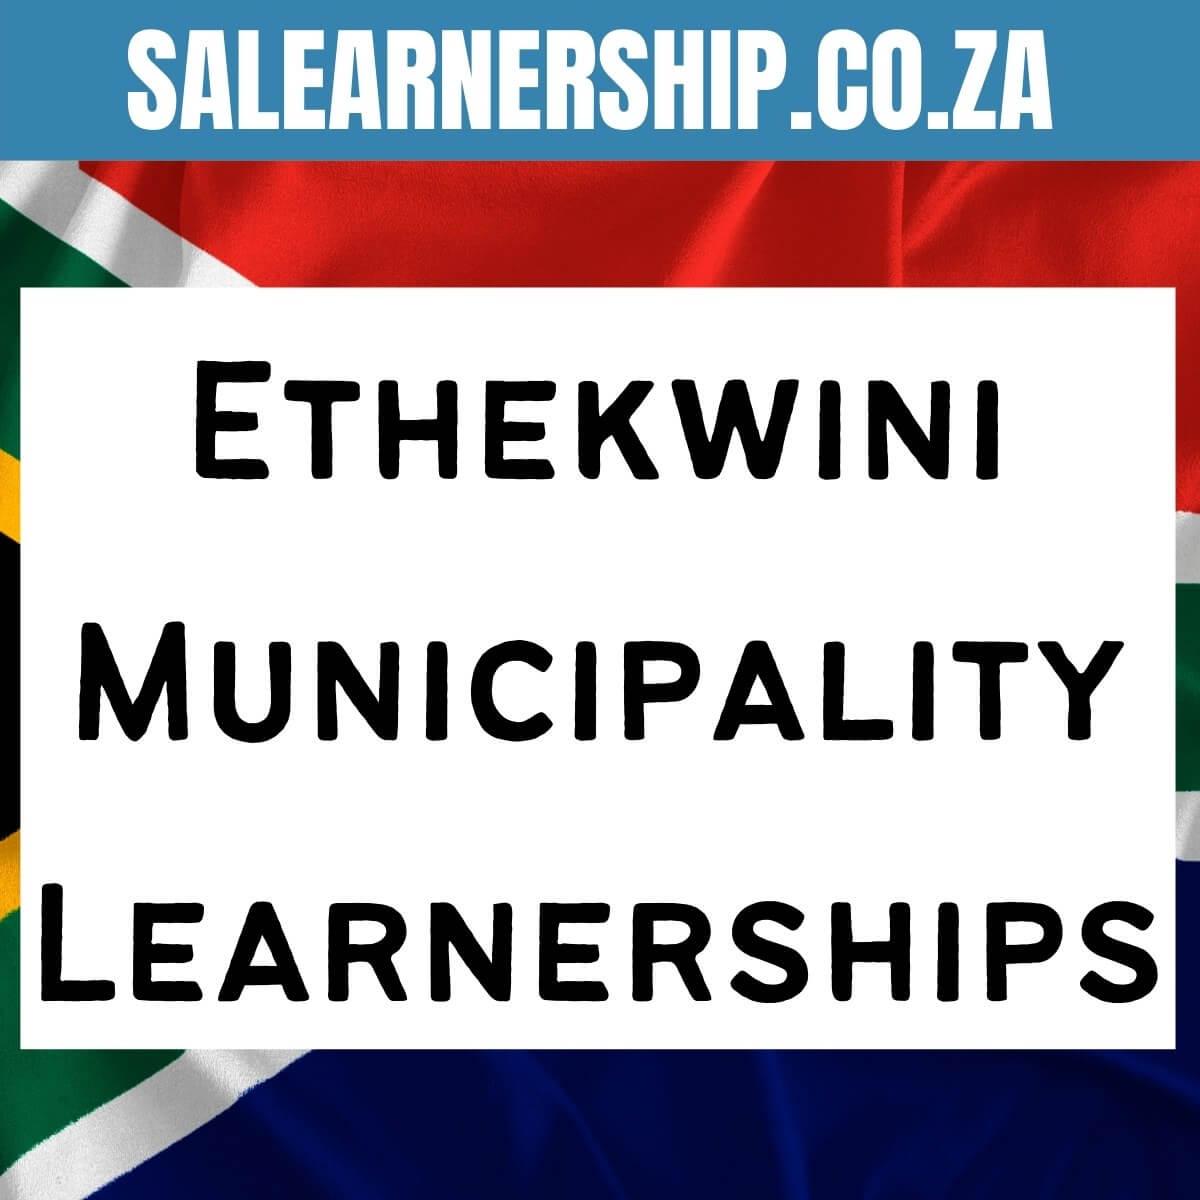 ethekwini municipality learnerships